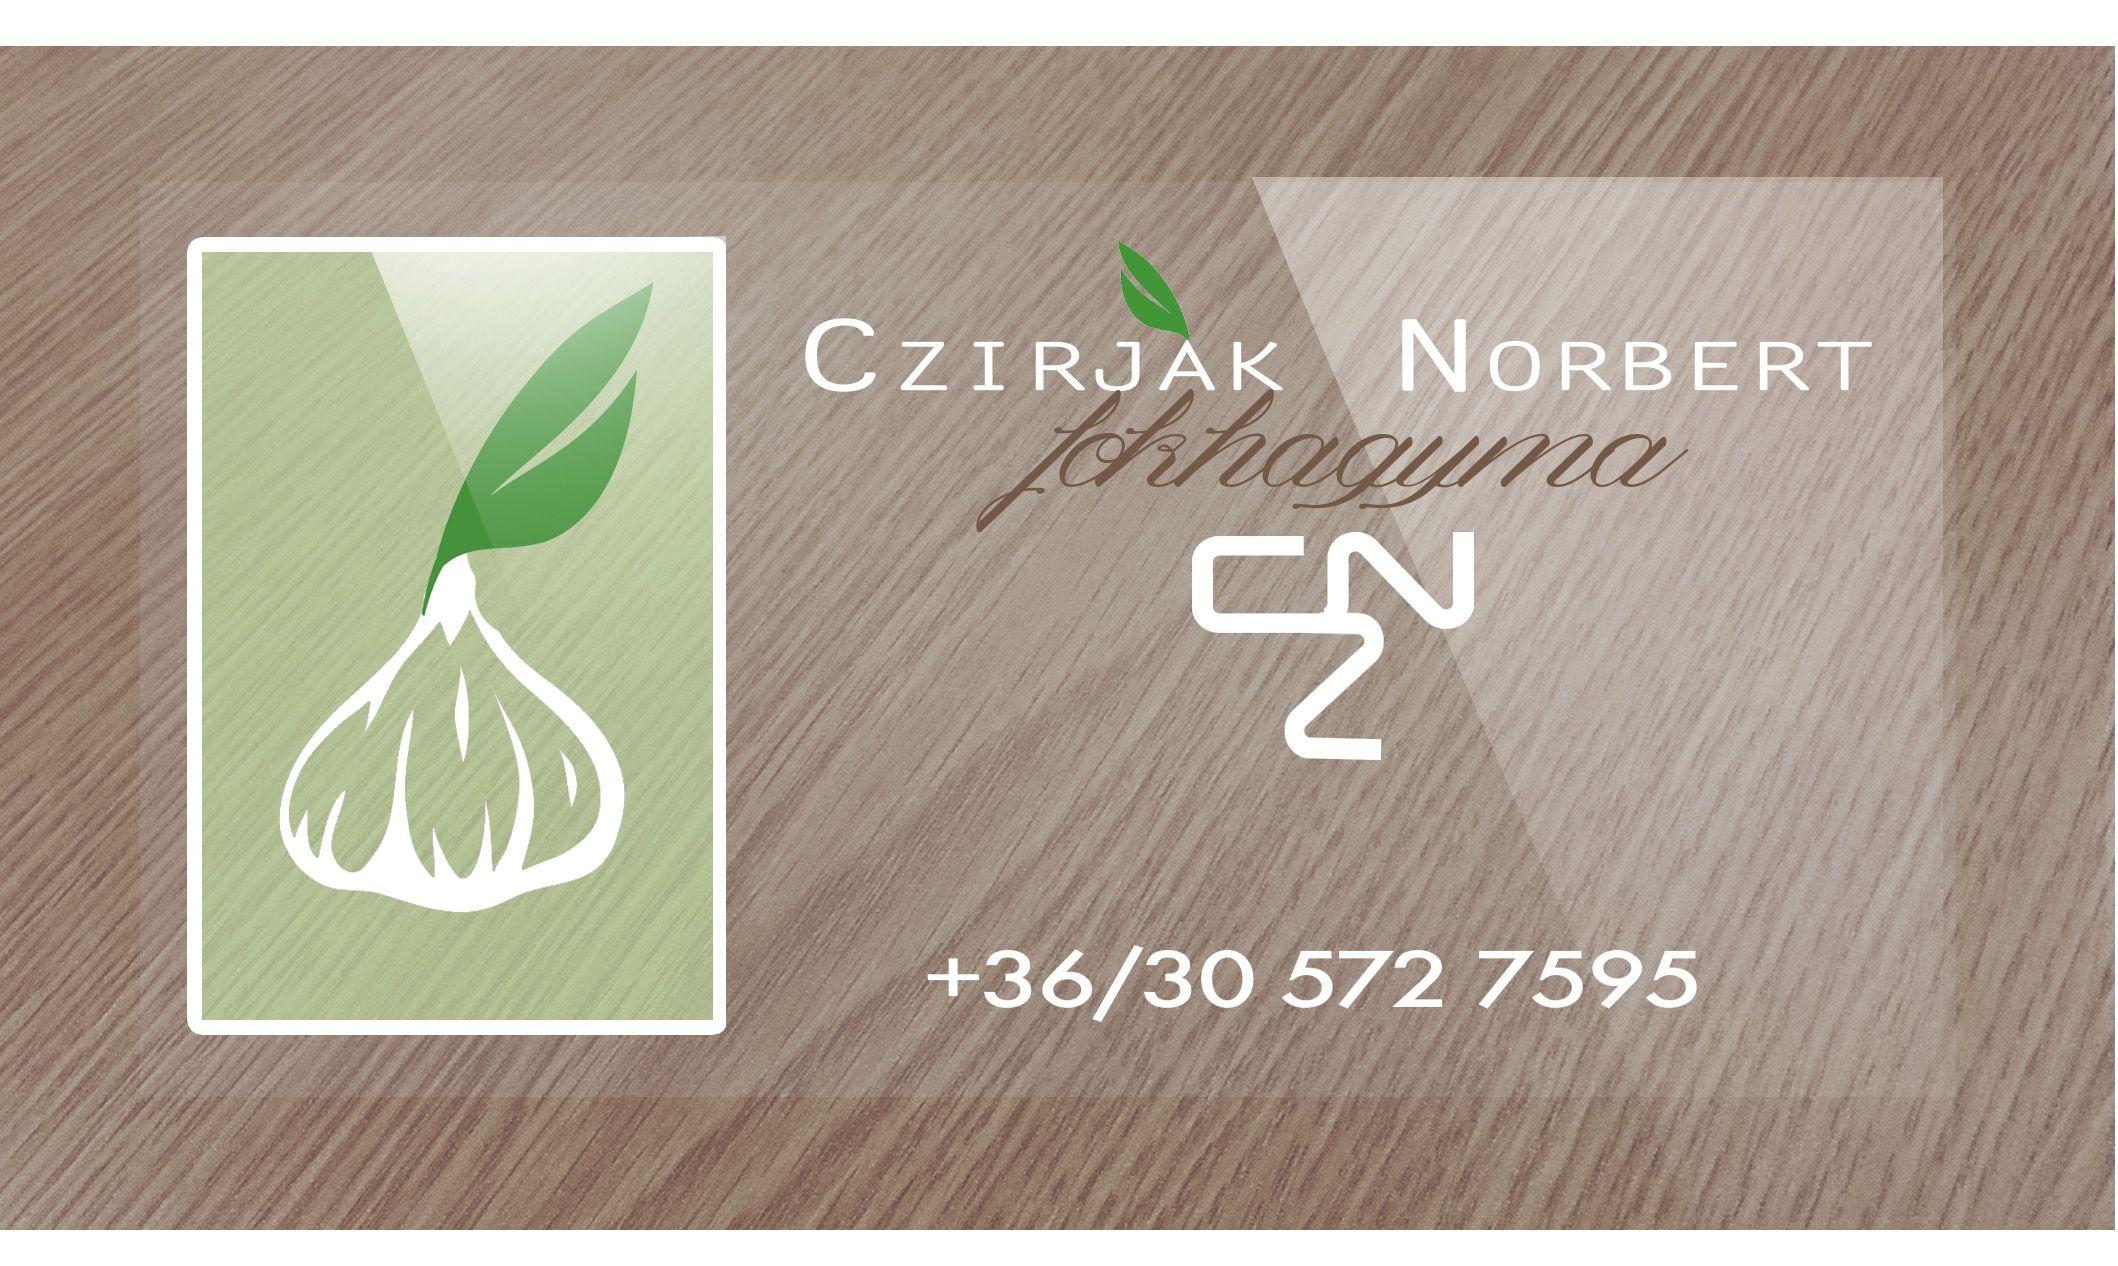 NameCard design by gwinkelman